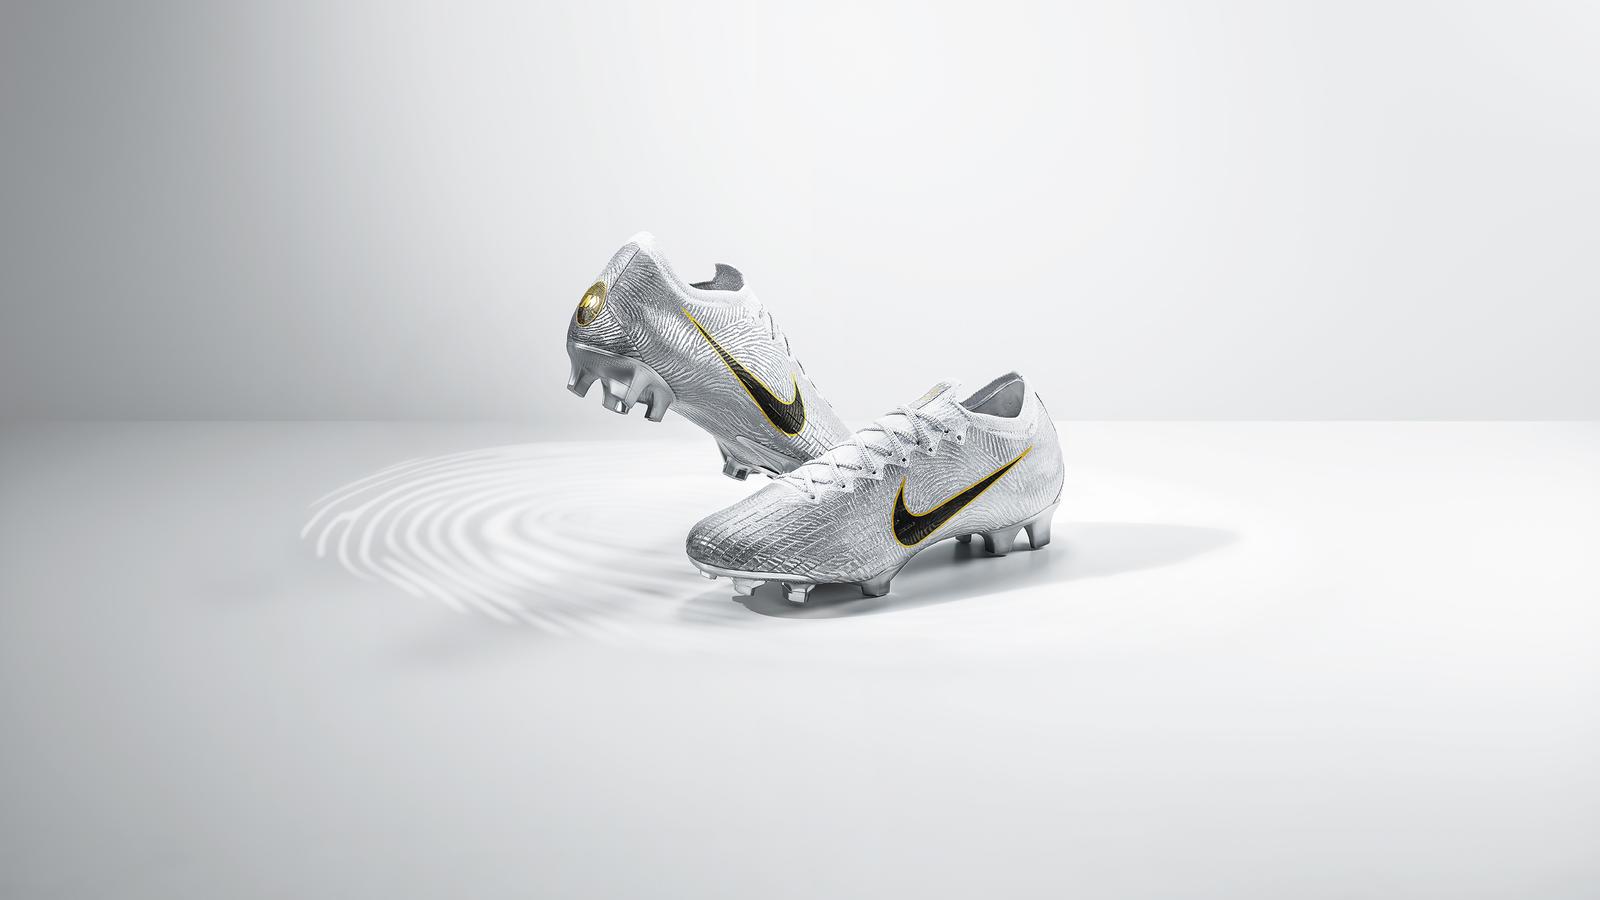 94969916767 Golden Touch Mercurial 360 - Nike News